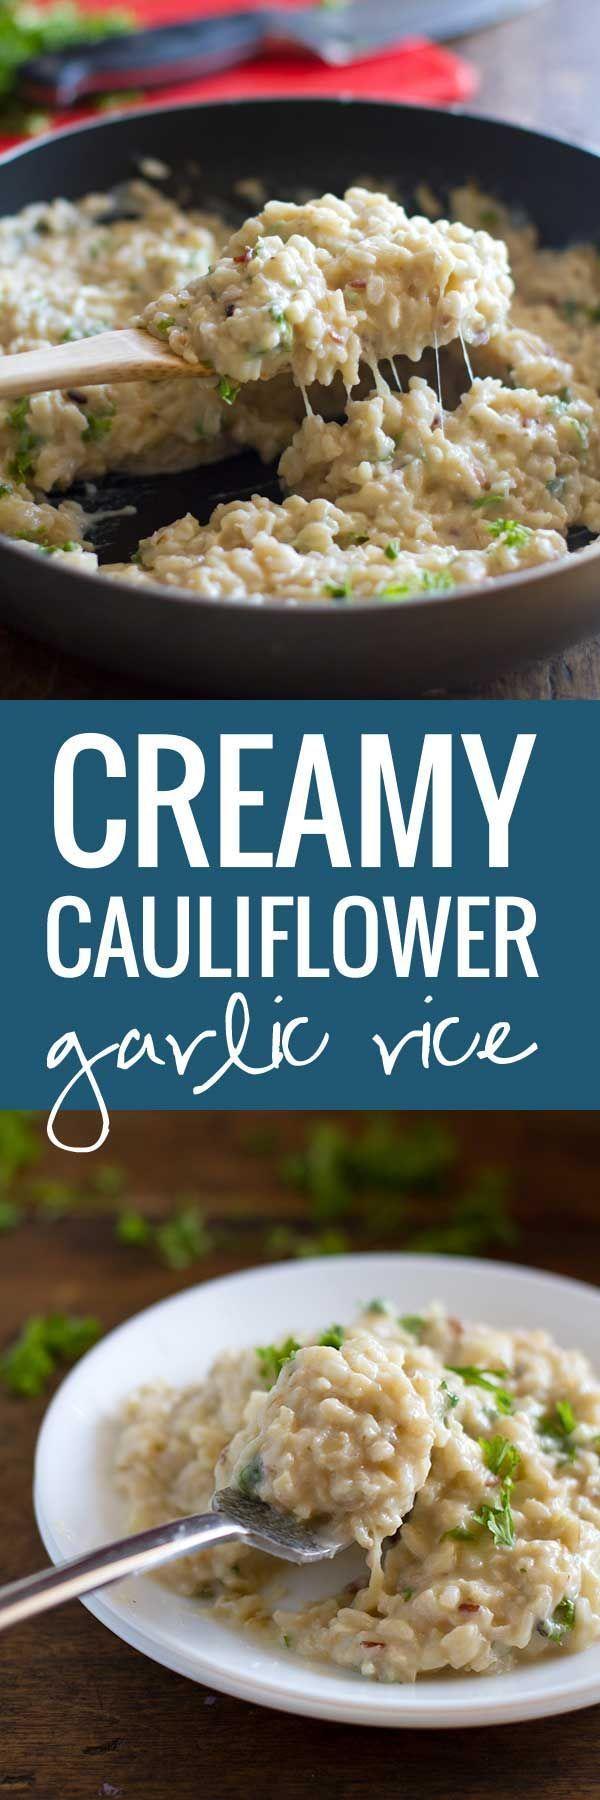 Creamy Cauliflower Garlic Rice - A delicious and healthy combination | http://pinchofyum.com